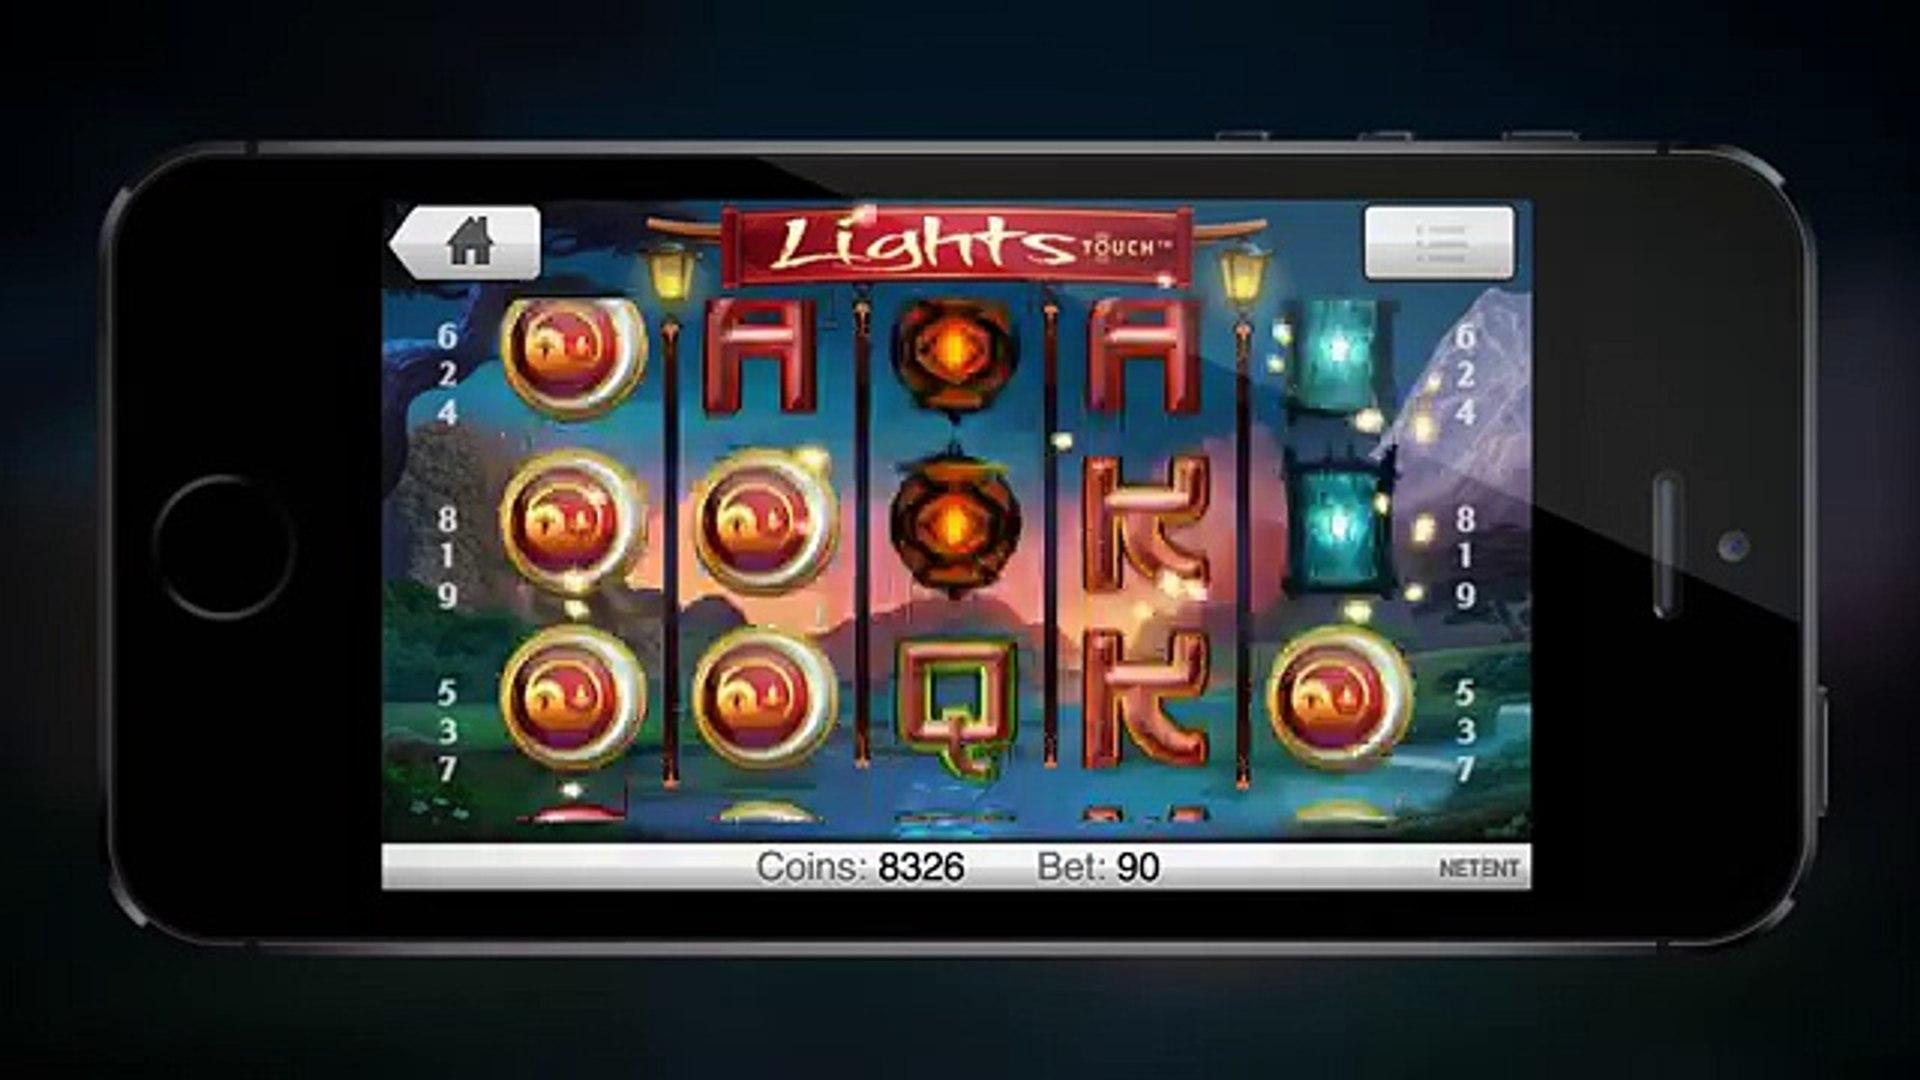 Lights gratis casino slot machine game online